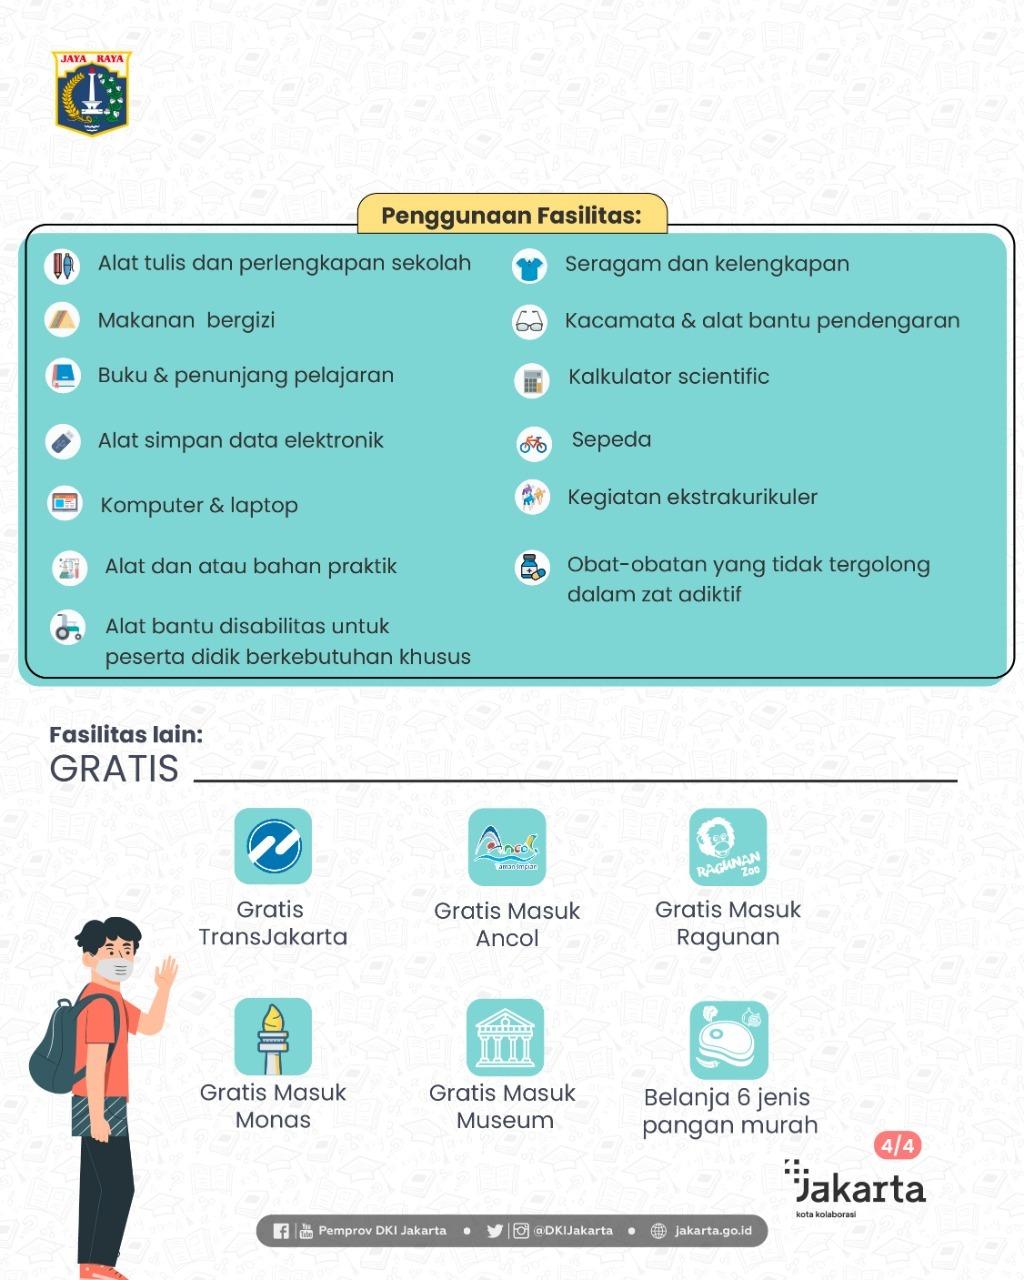 Tuntas Pendidikan Dengan KJP Plus Tahap 1 Tahun 2021-Slide_4